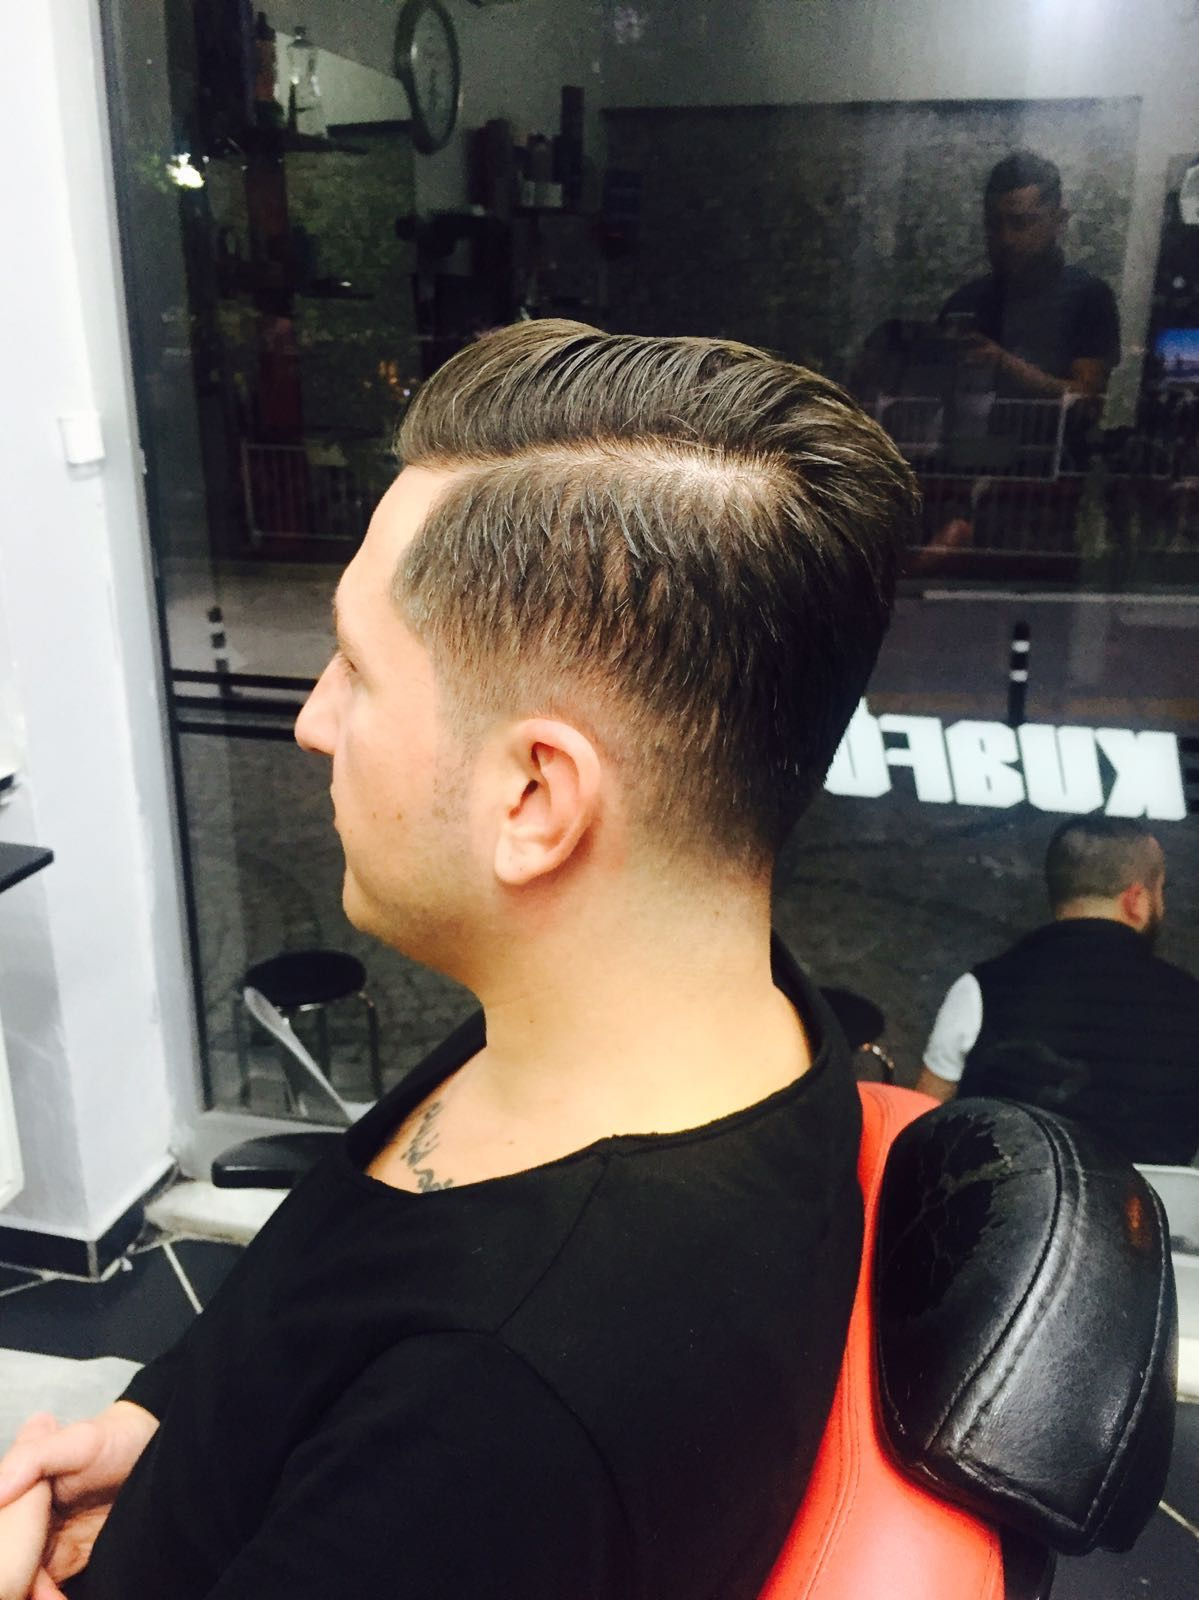 Haircut styles short on sides long on top man haircut style   Şahsına münhâsırlar  pinterest